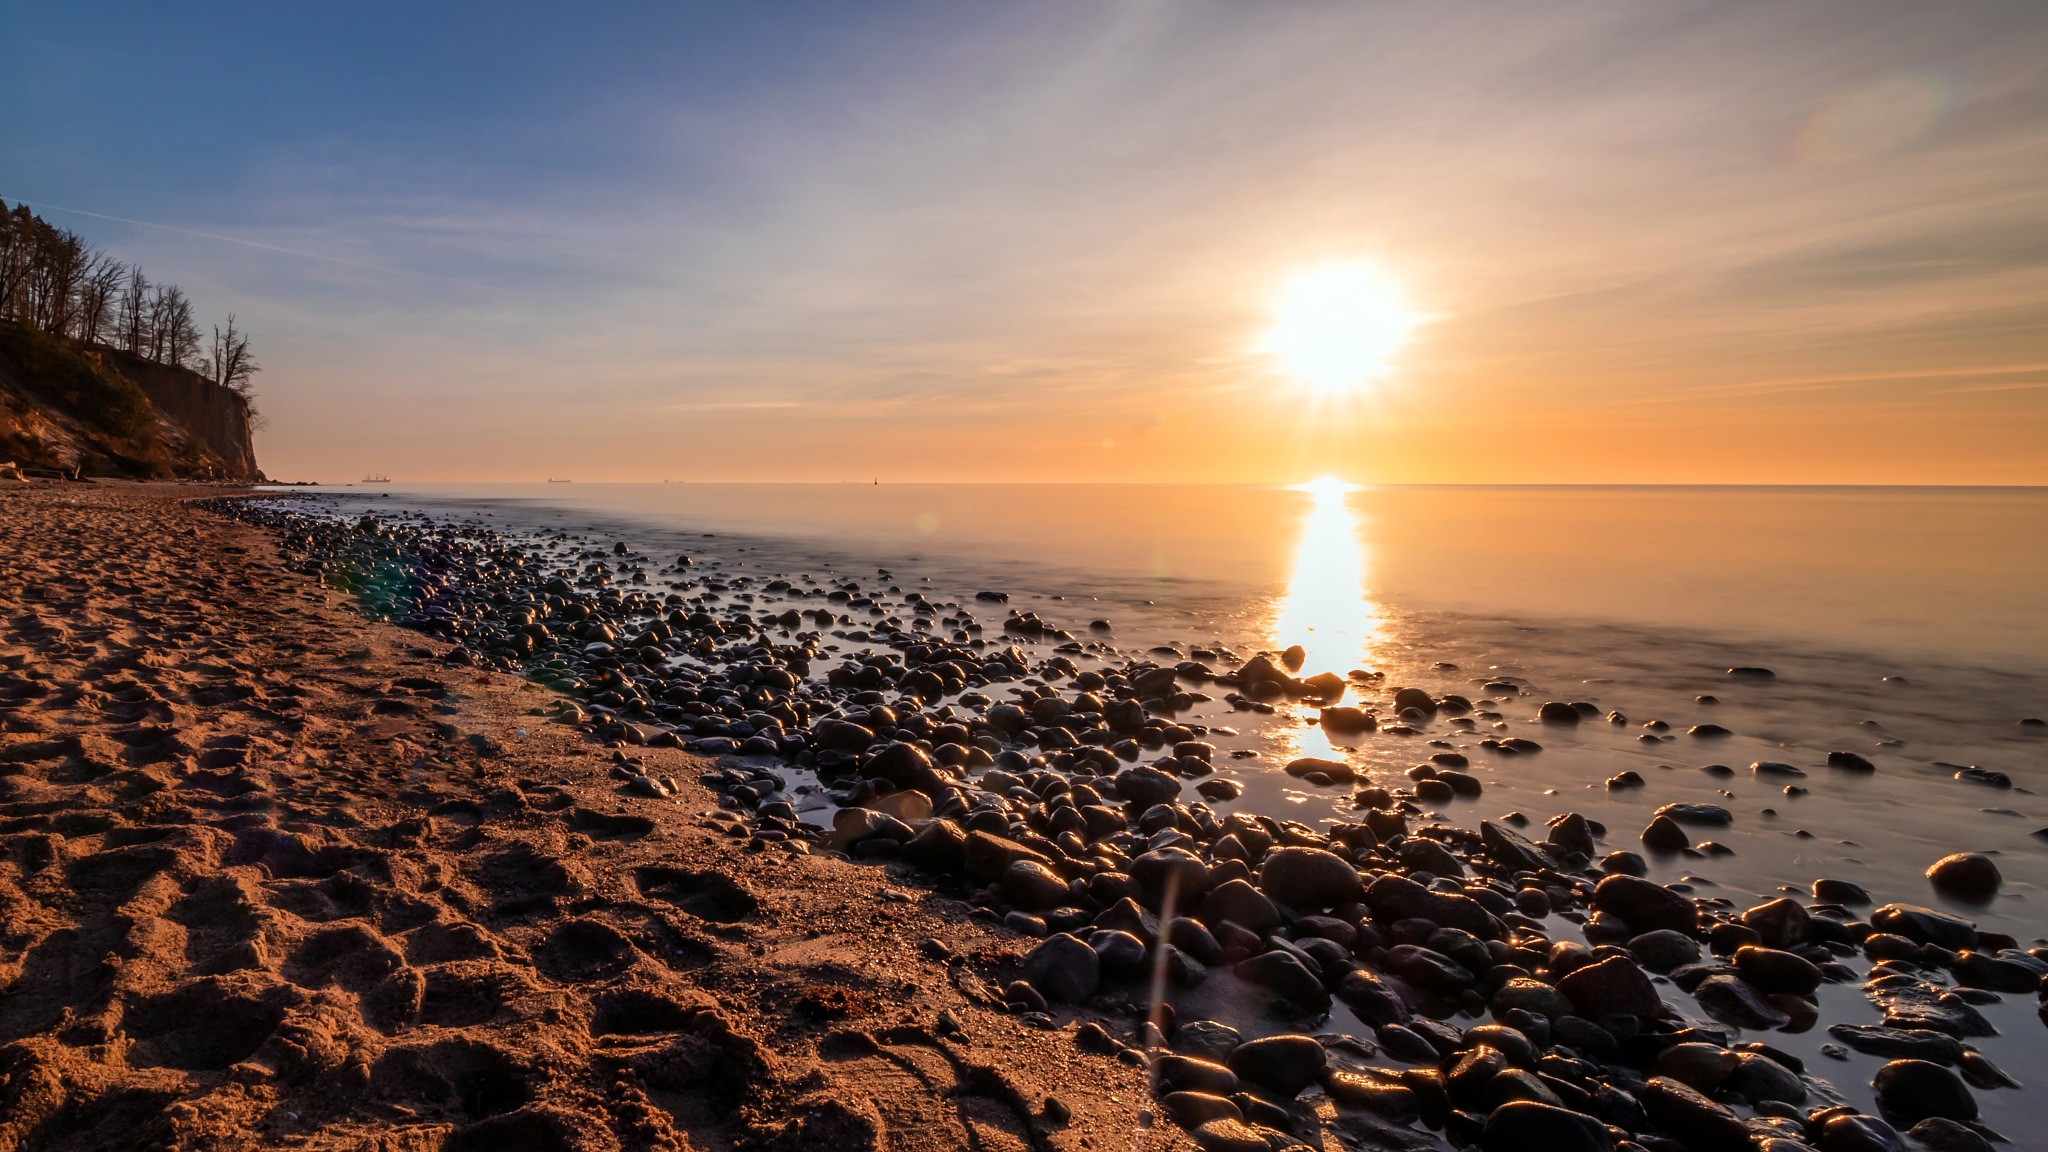 Sunrise, Baltis Sea by Paweł